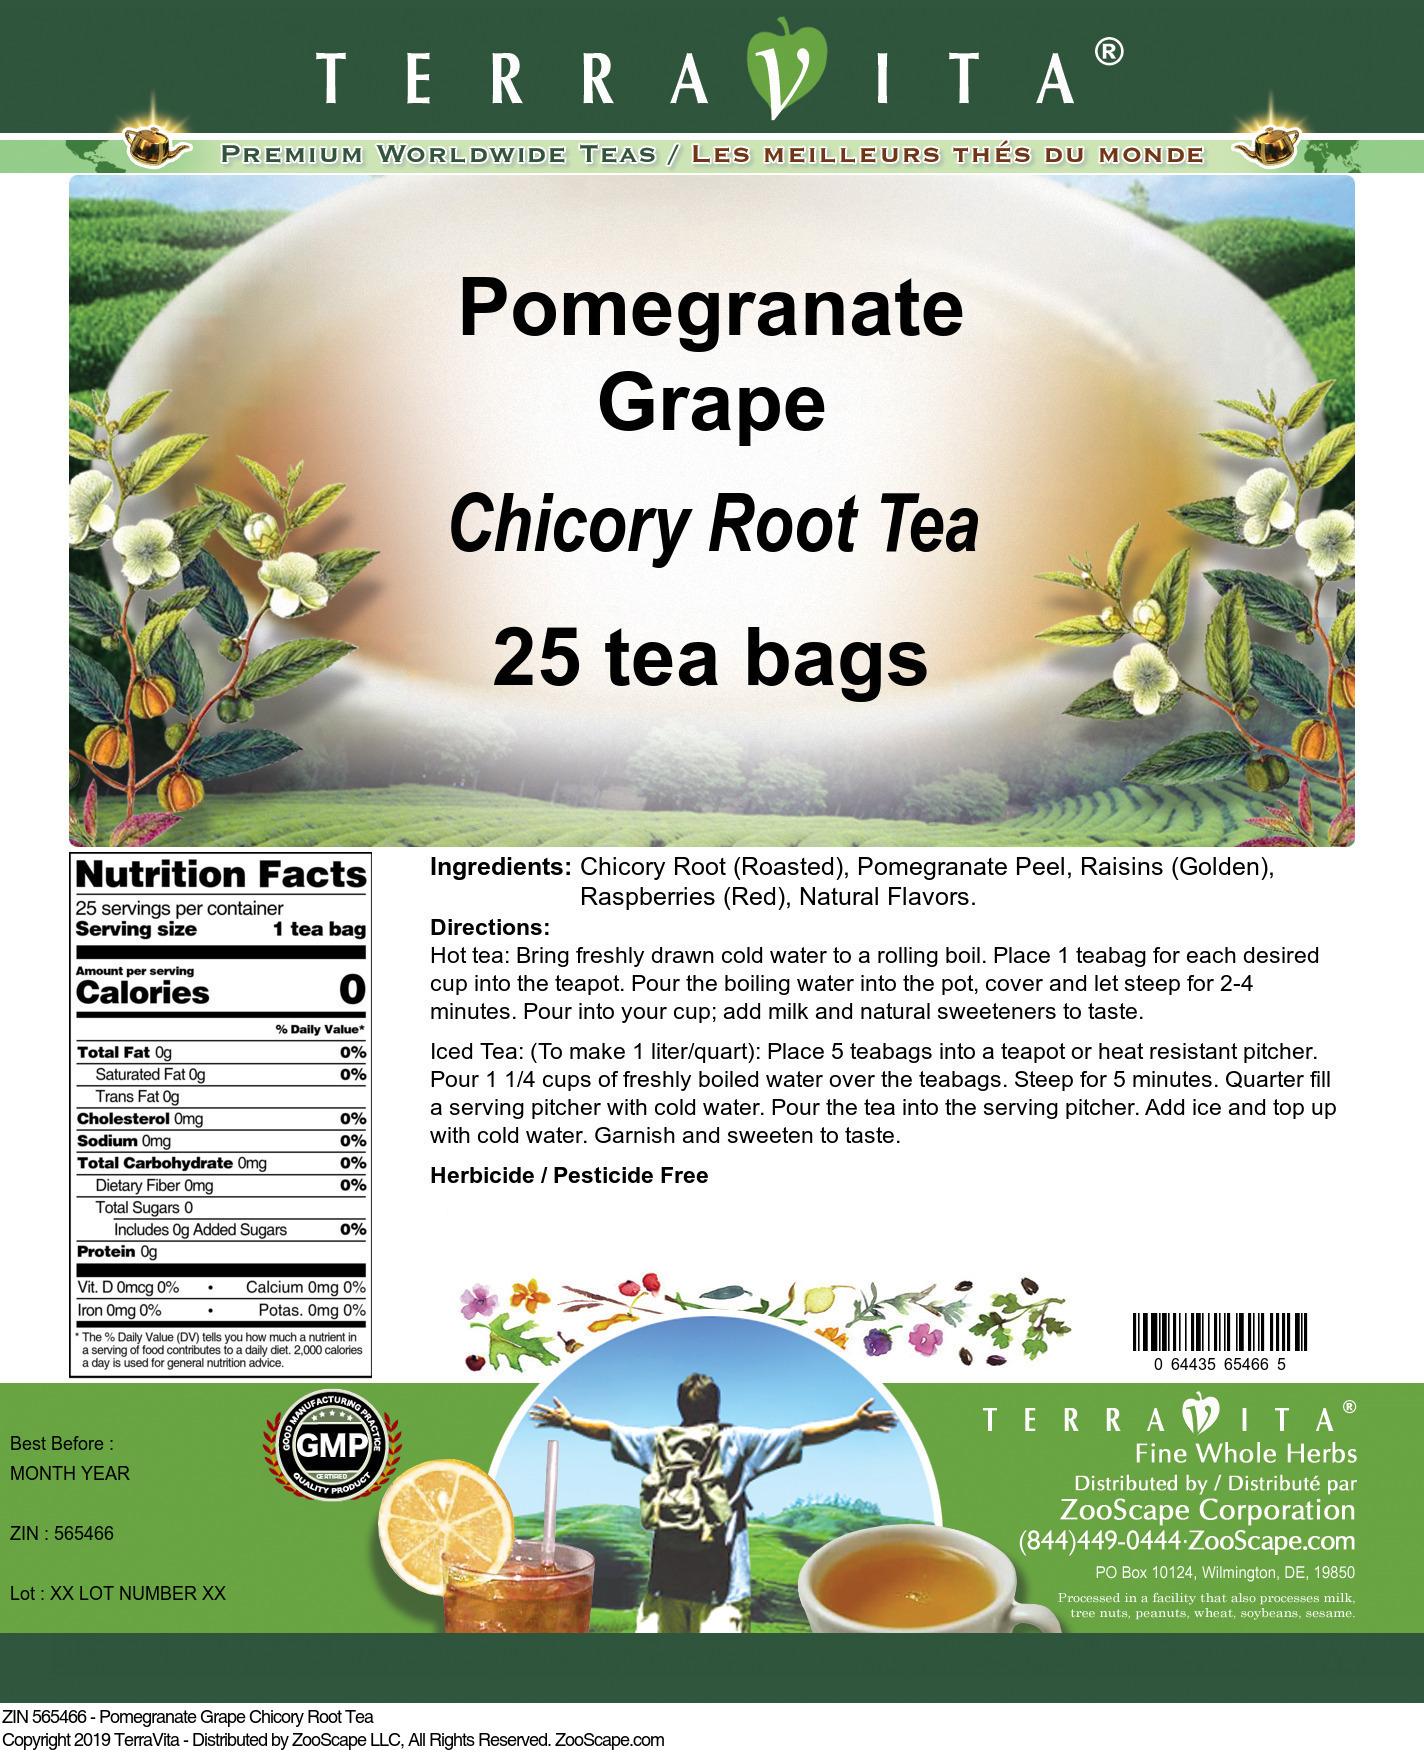 Pomegranate Grape Chicory Root